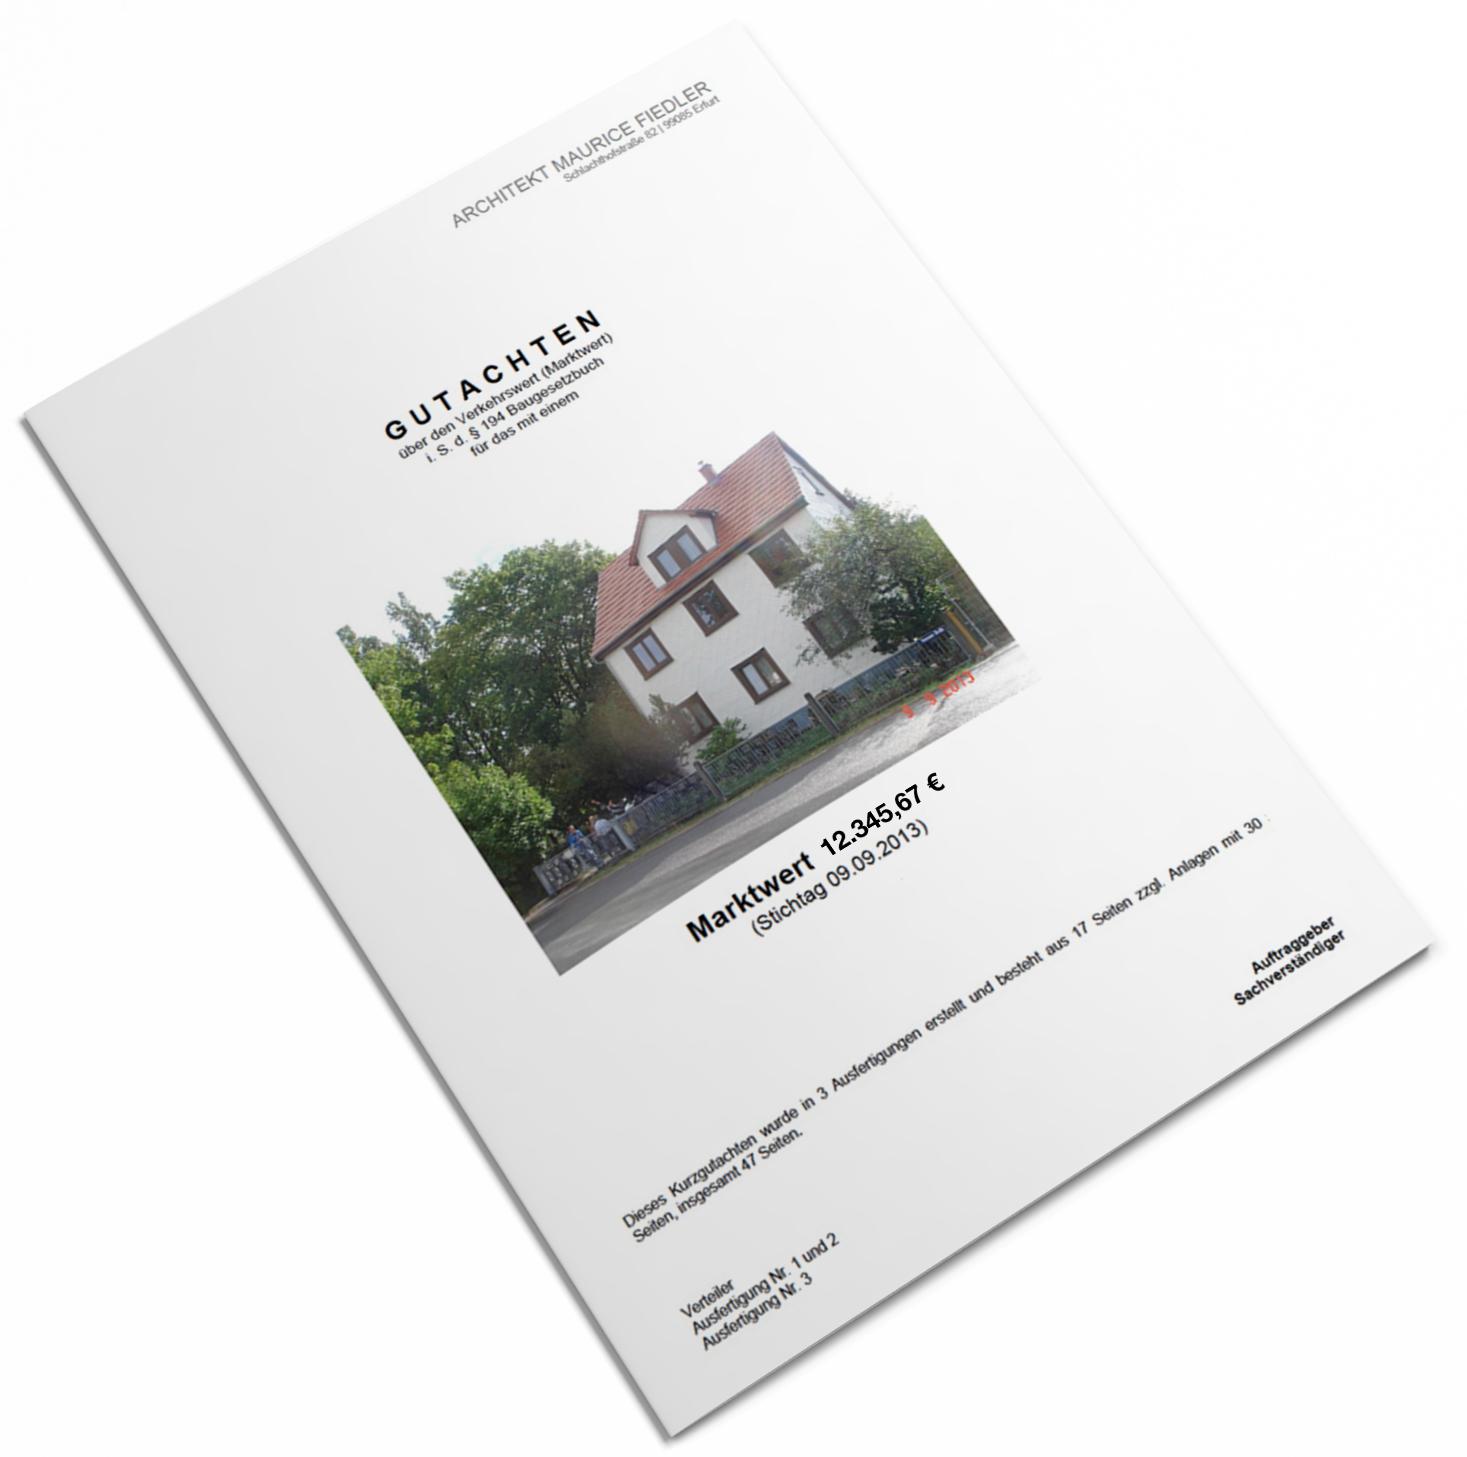 Immobilienbewertung Erfurt | ARCHITEKT MAURICE FIEDLER